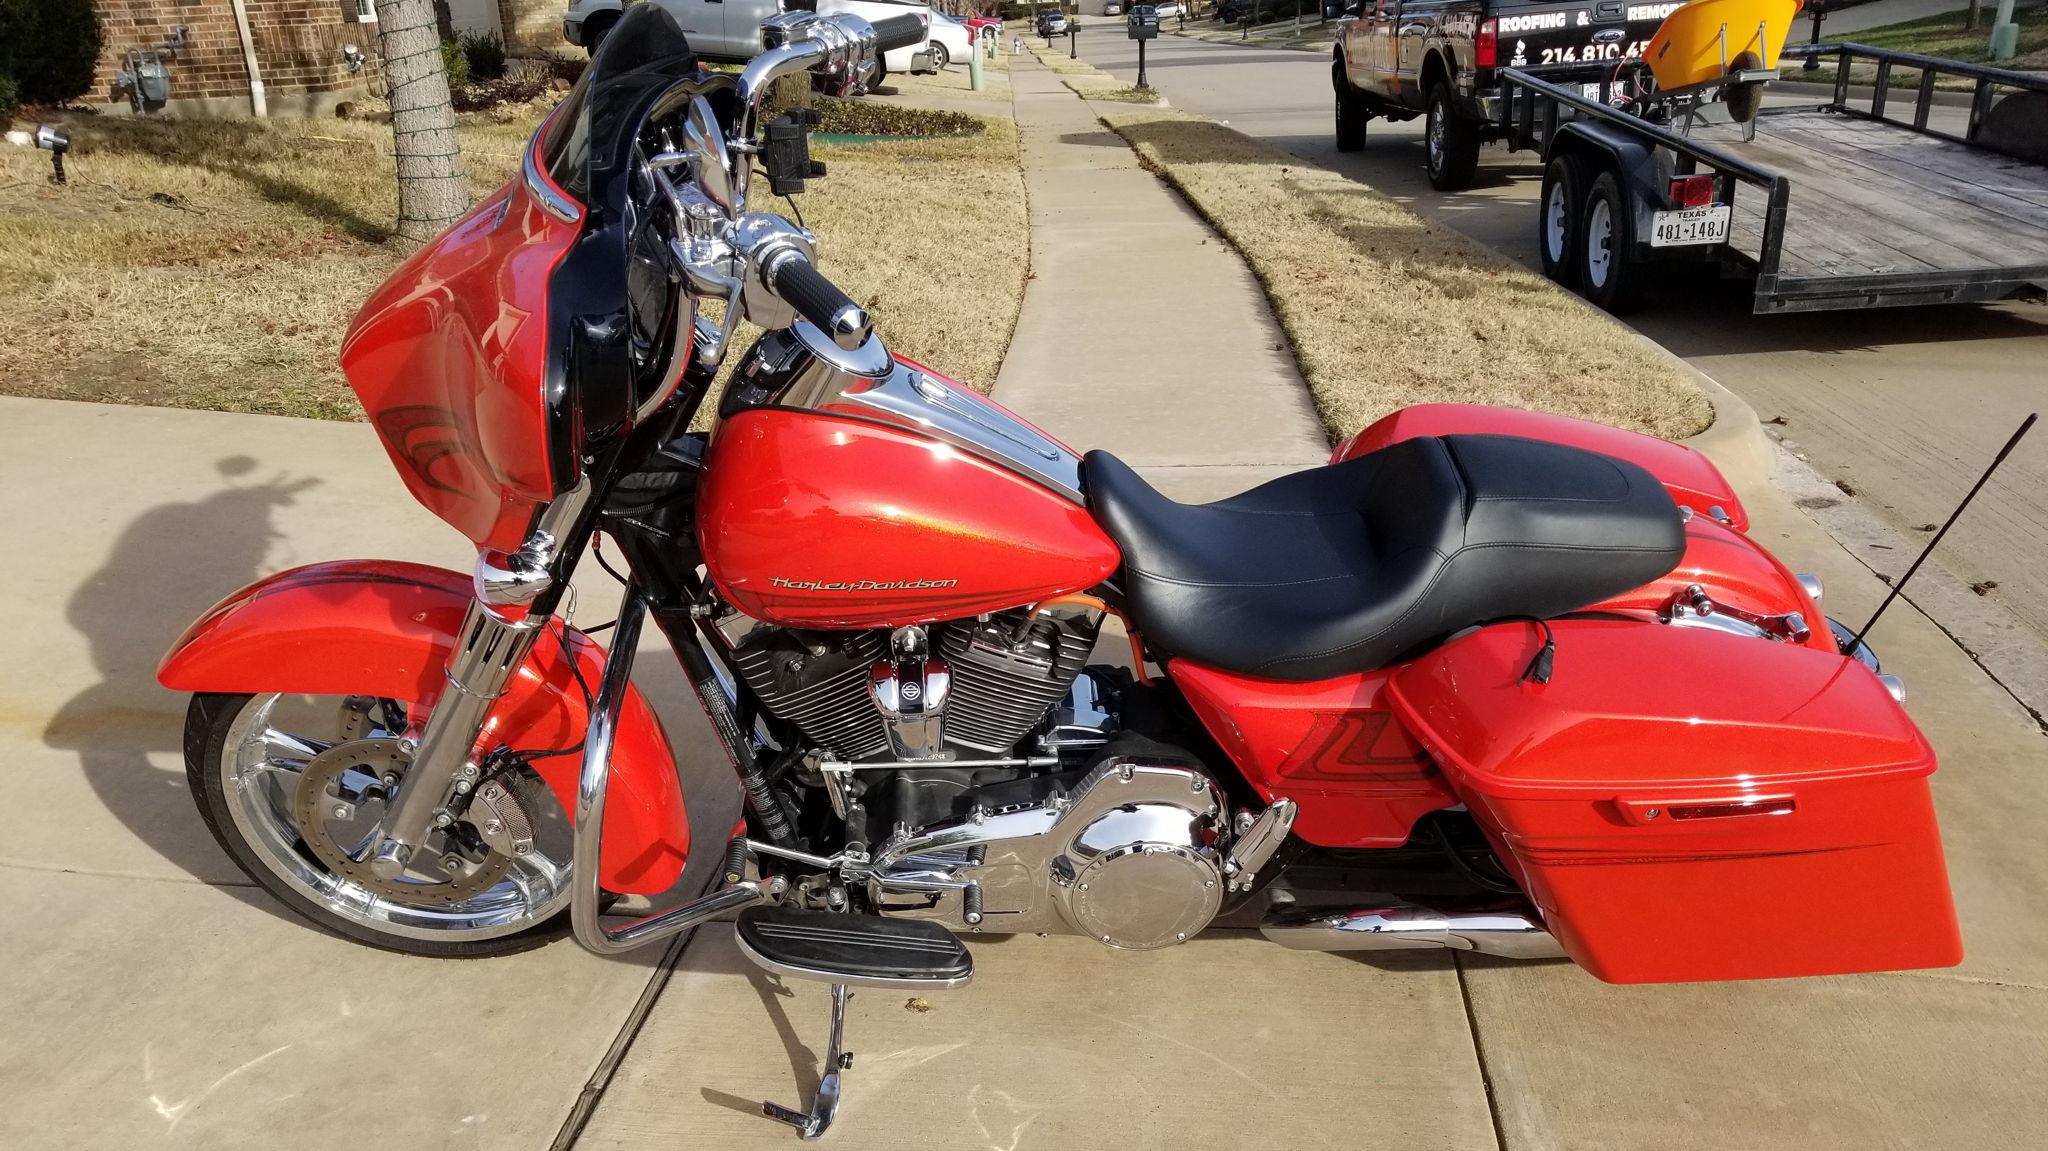 Dallas Harley Davidson >> Harley Davidson Street Glide Special For Rent Near Lake Dallas Tx